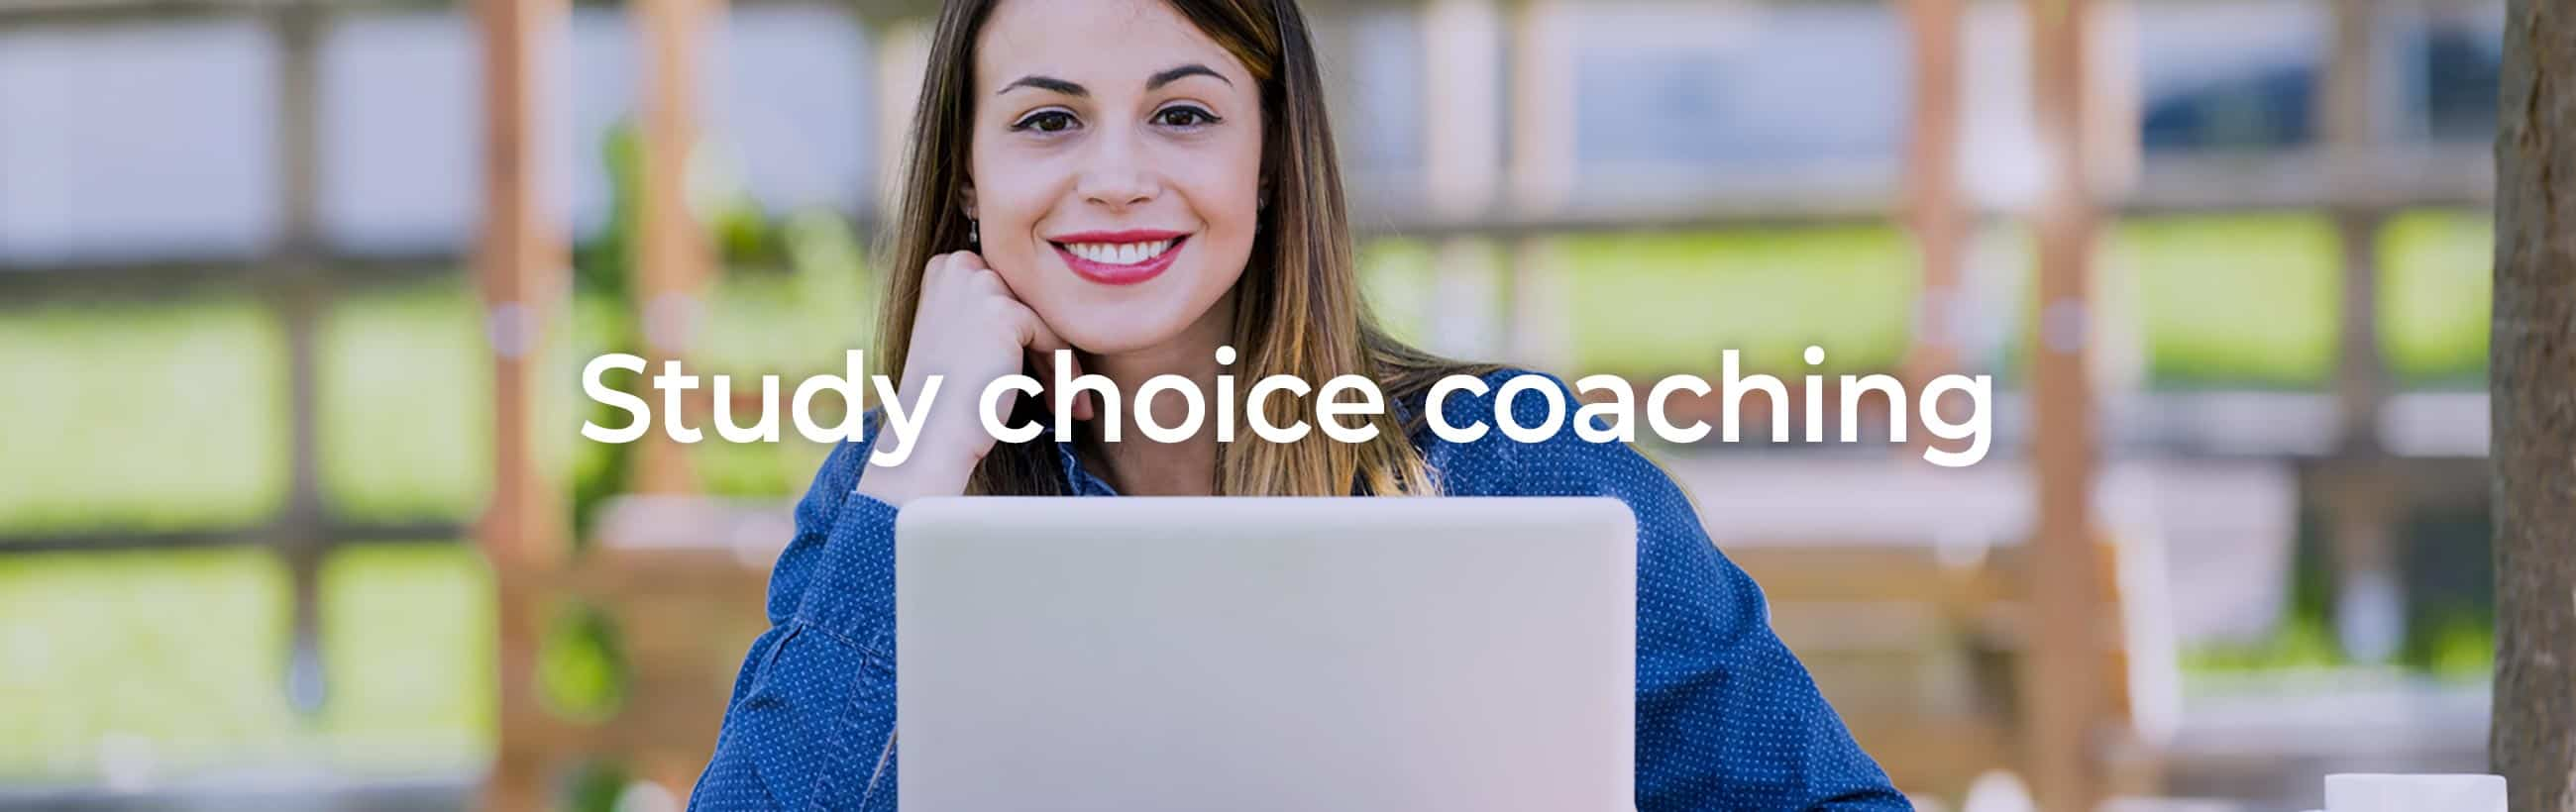 Blueberry Hill - Study choice coaching